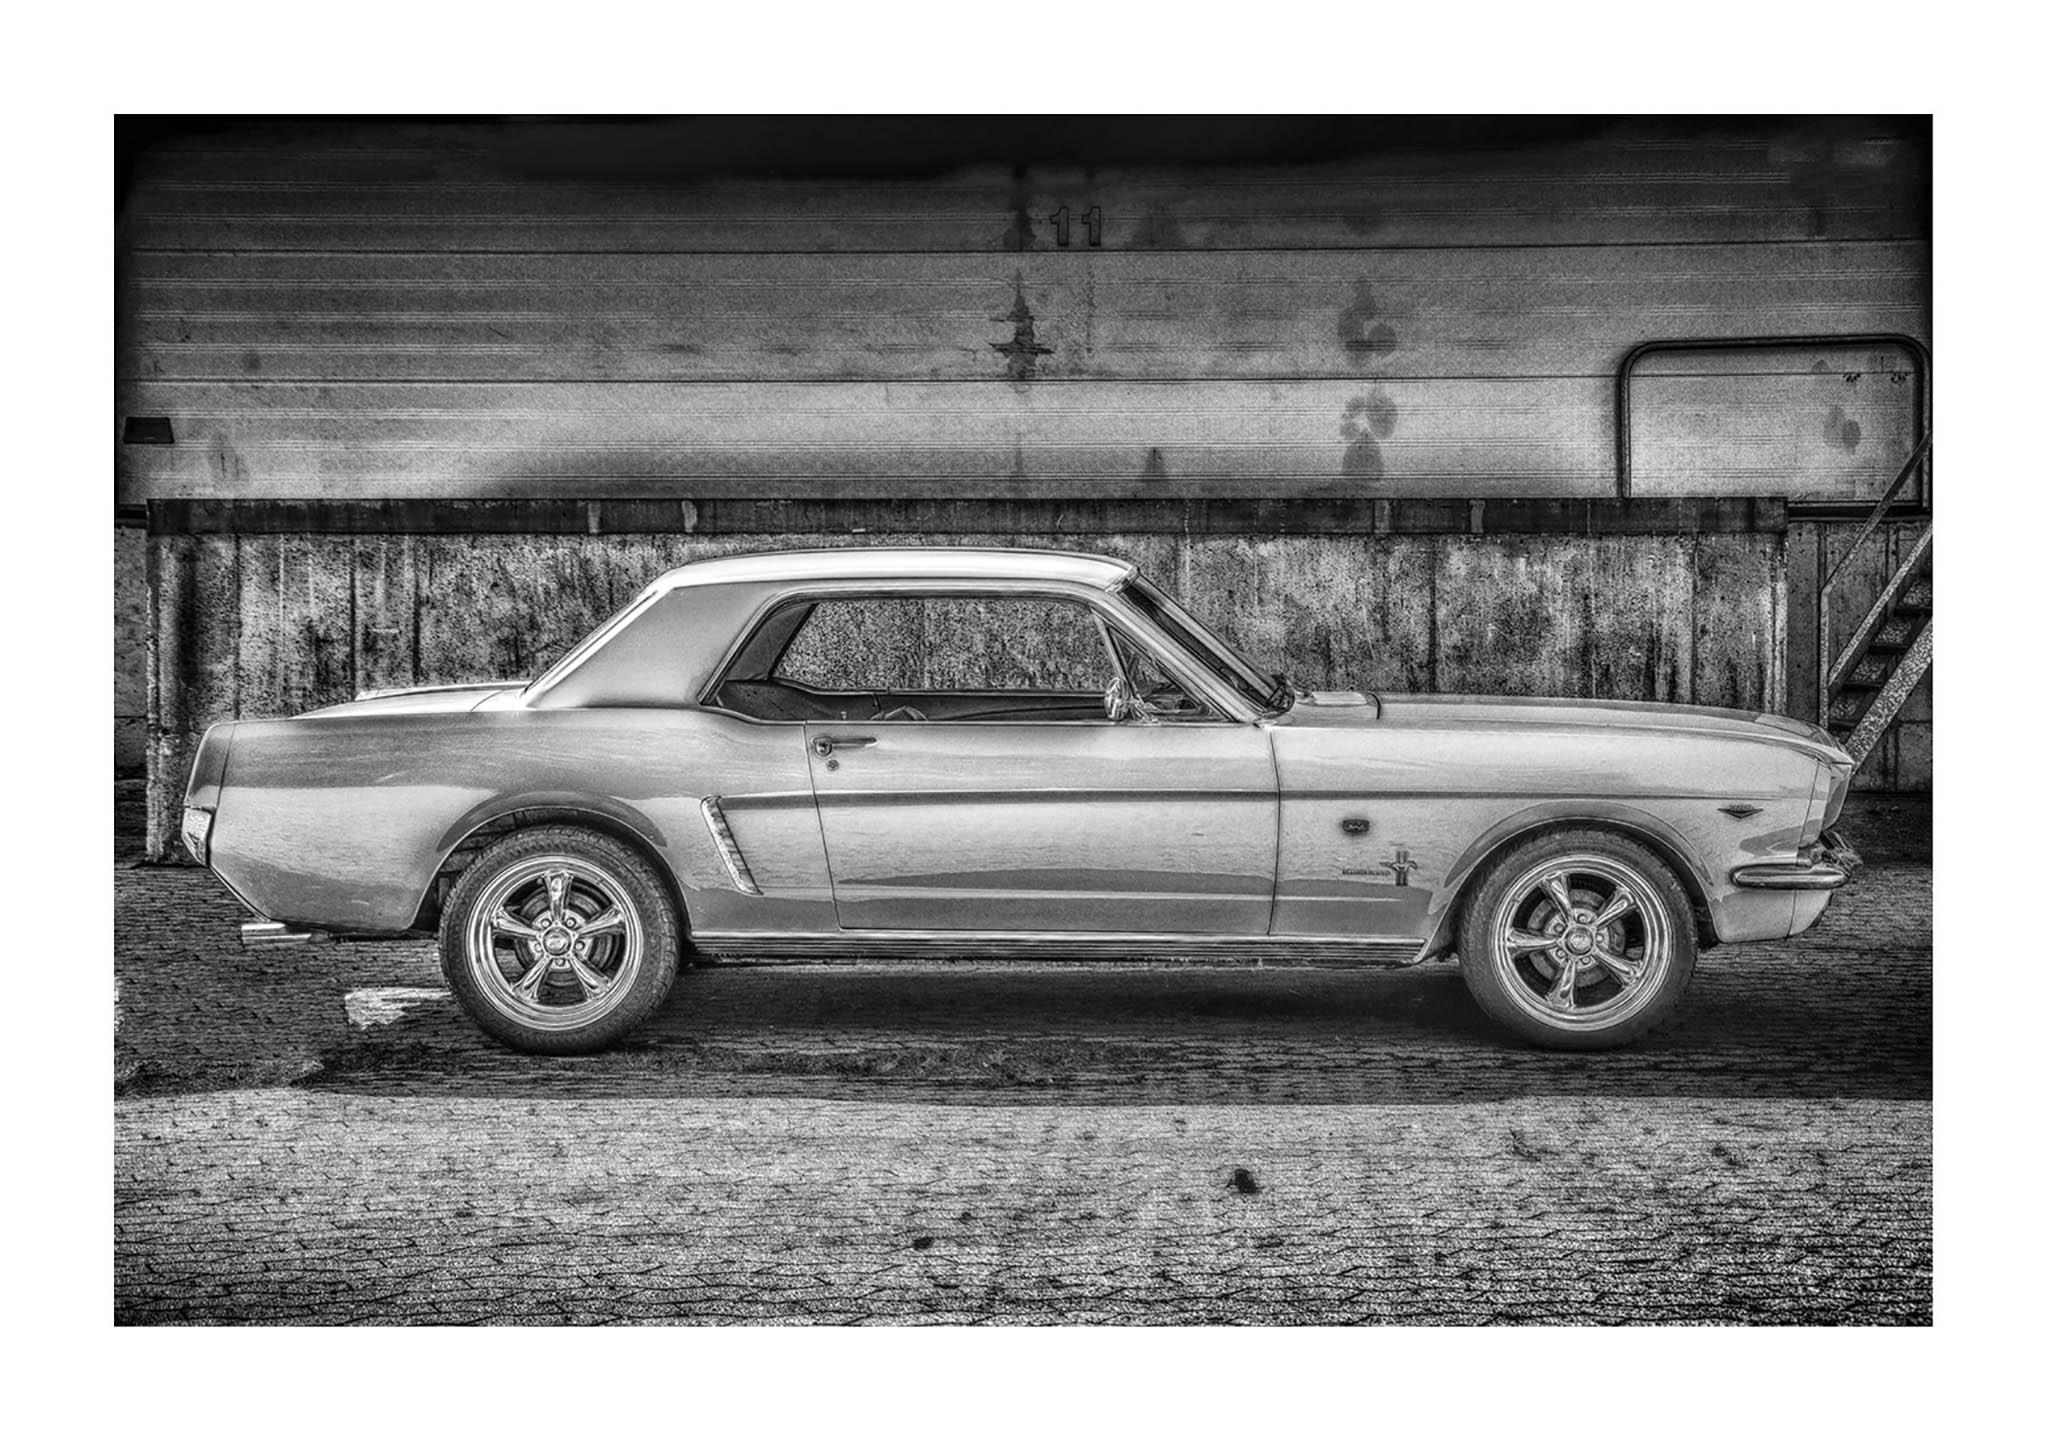 uge 44 - Mustang - Johnny Kristenseen